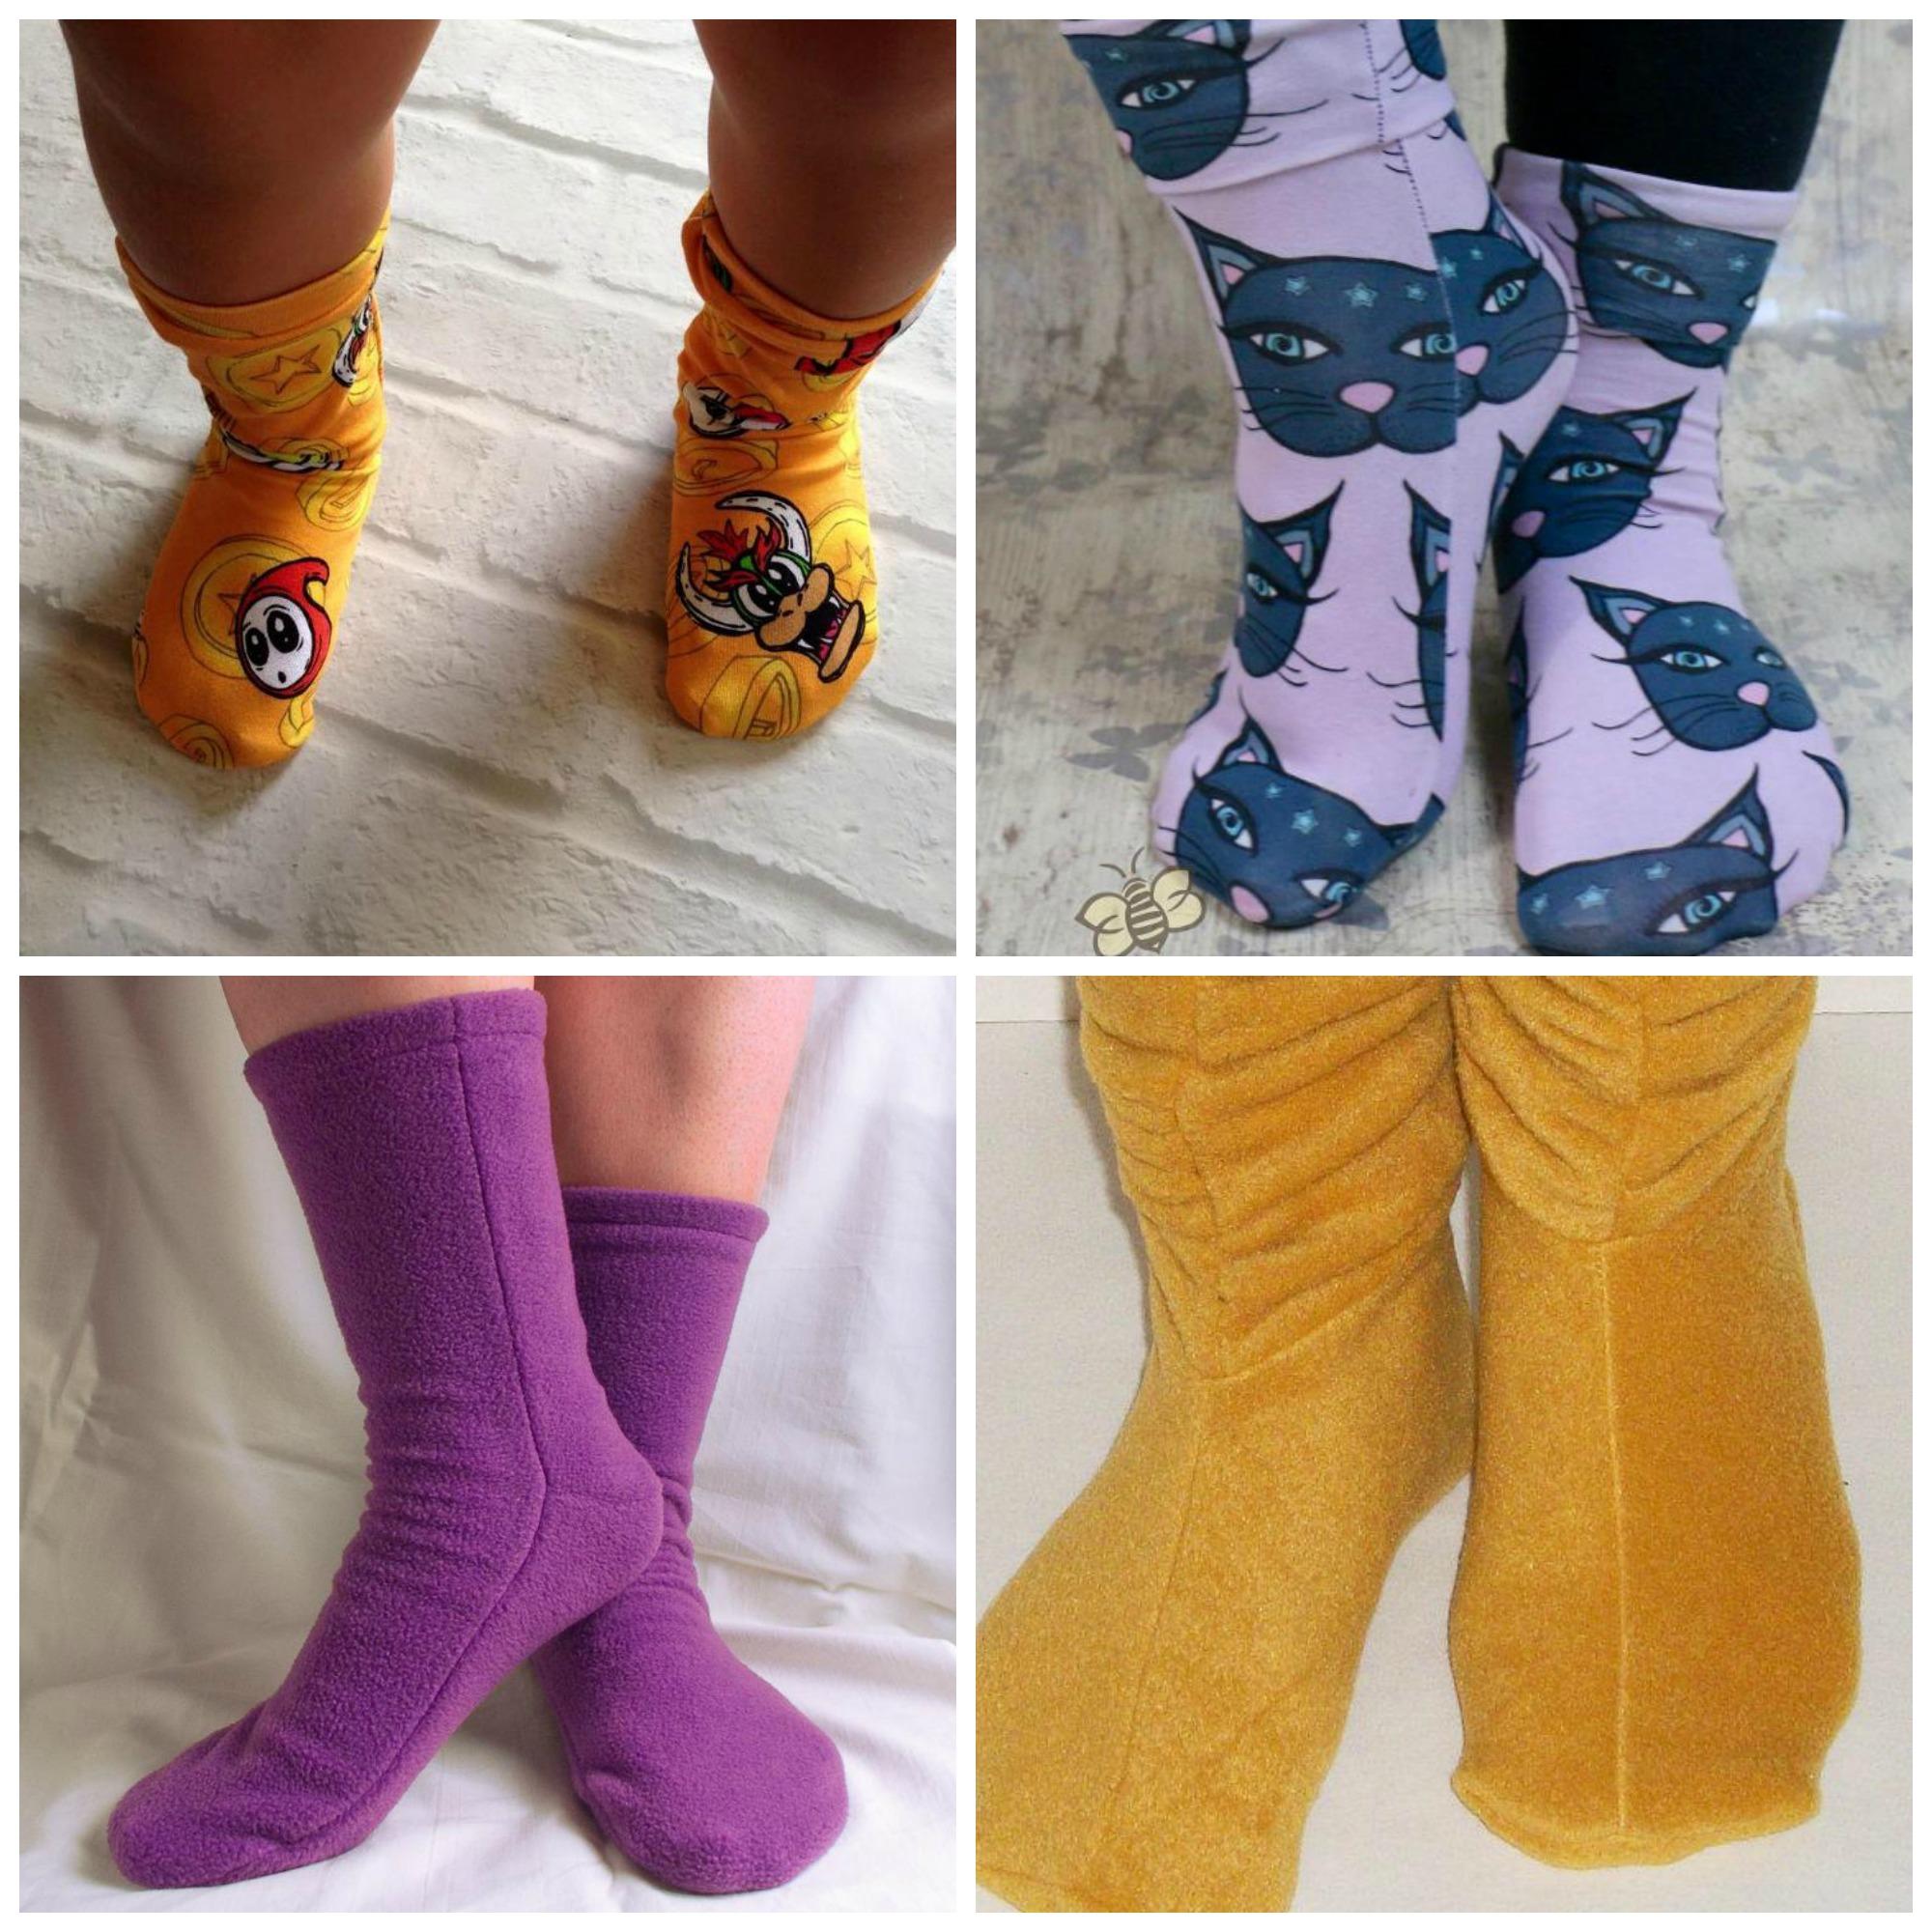 How to Make Socks